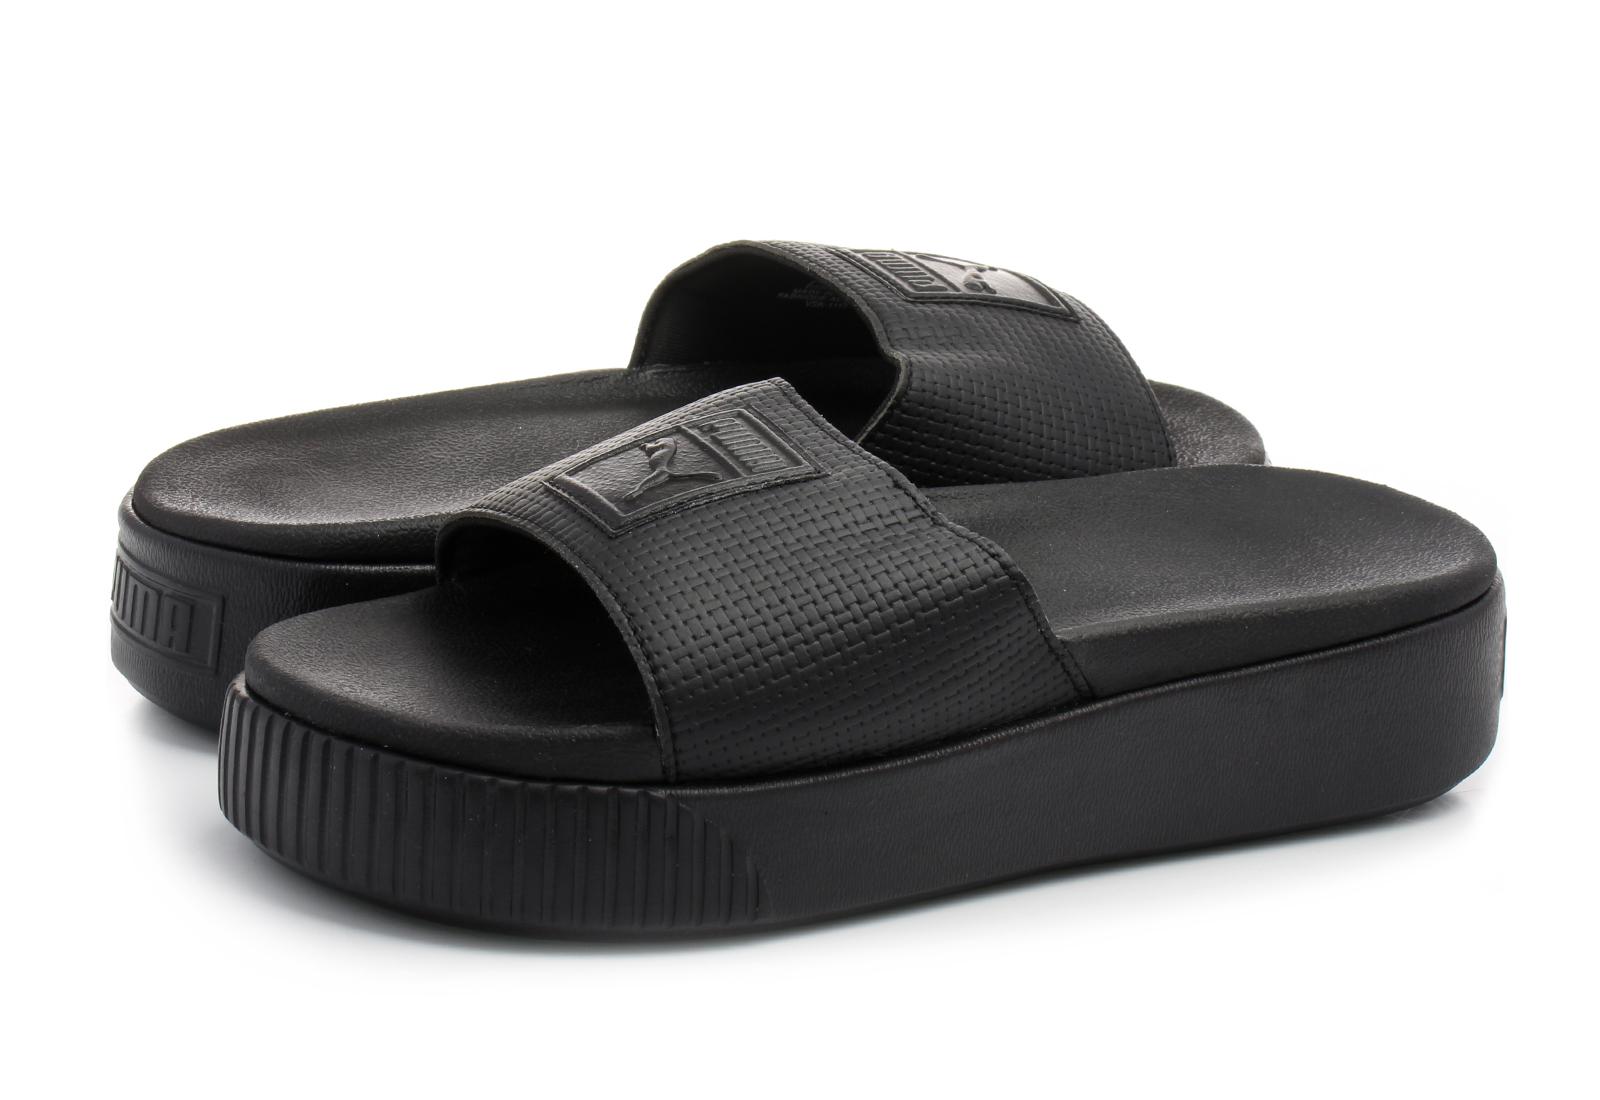 8baddd5fde Puma Papucs - Platform Slide Wns Ep - 36612202-blk - Office Shoes ...